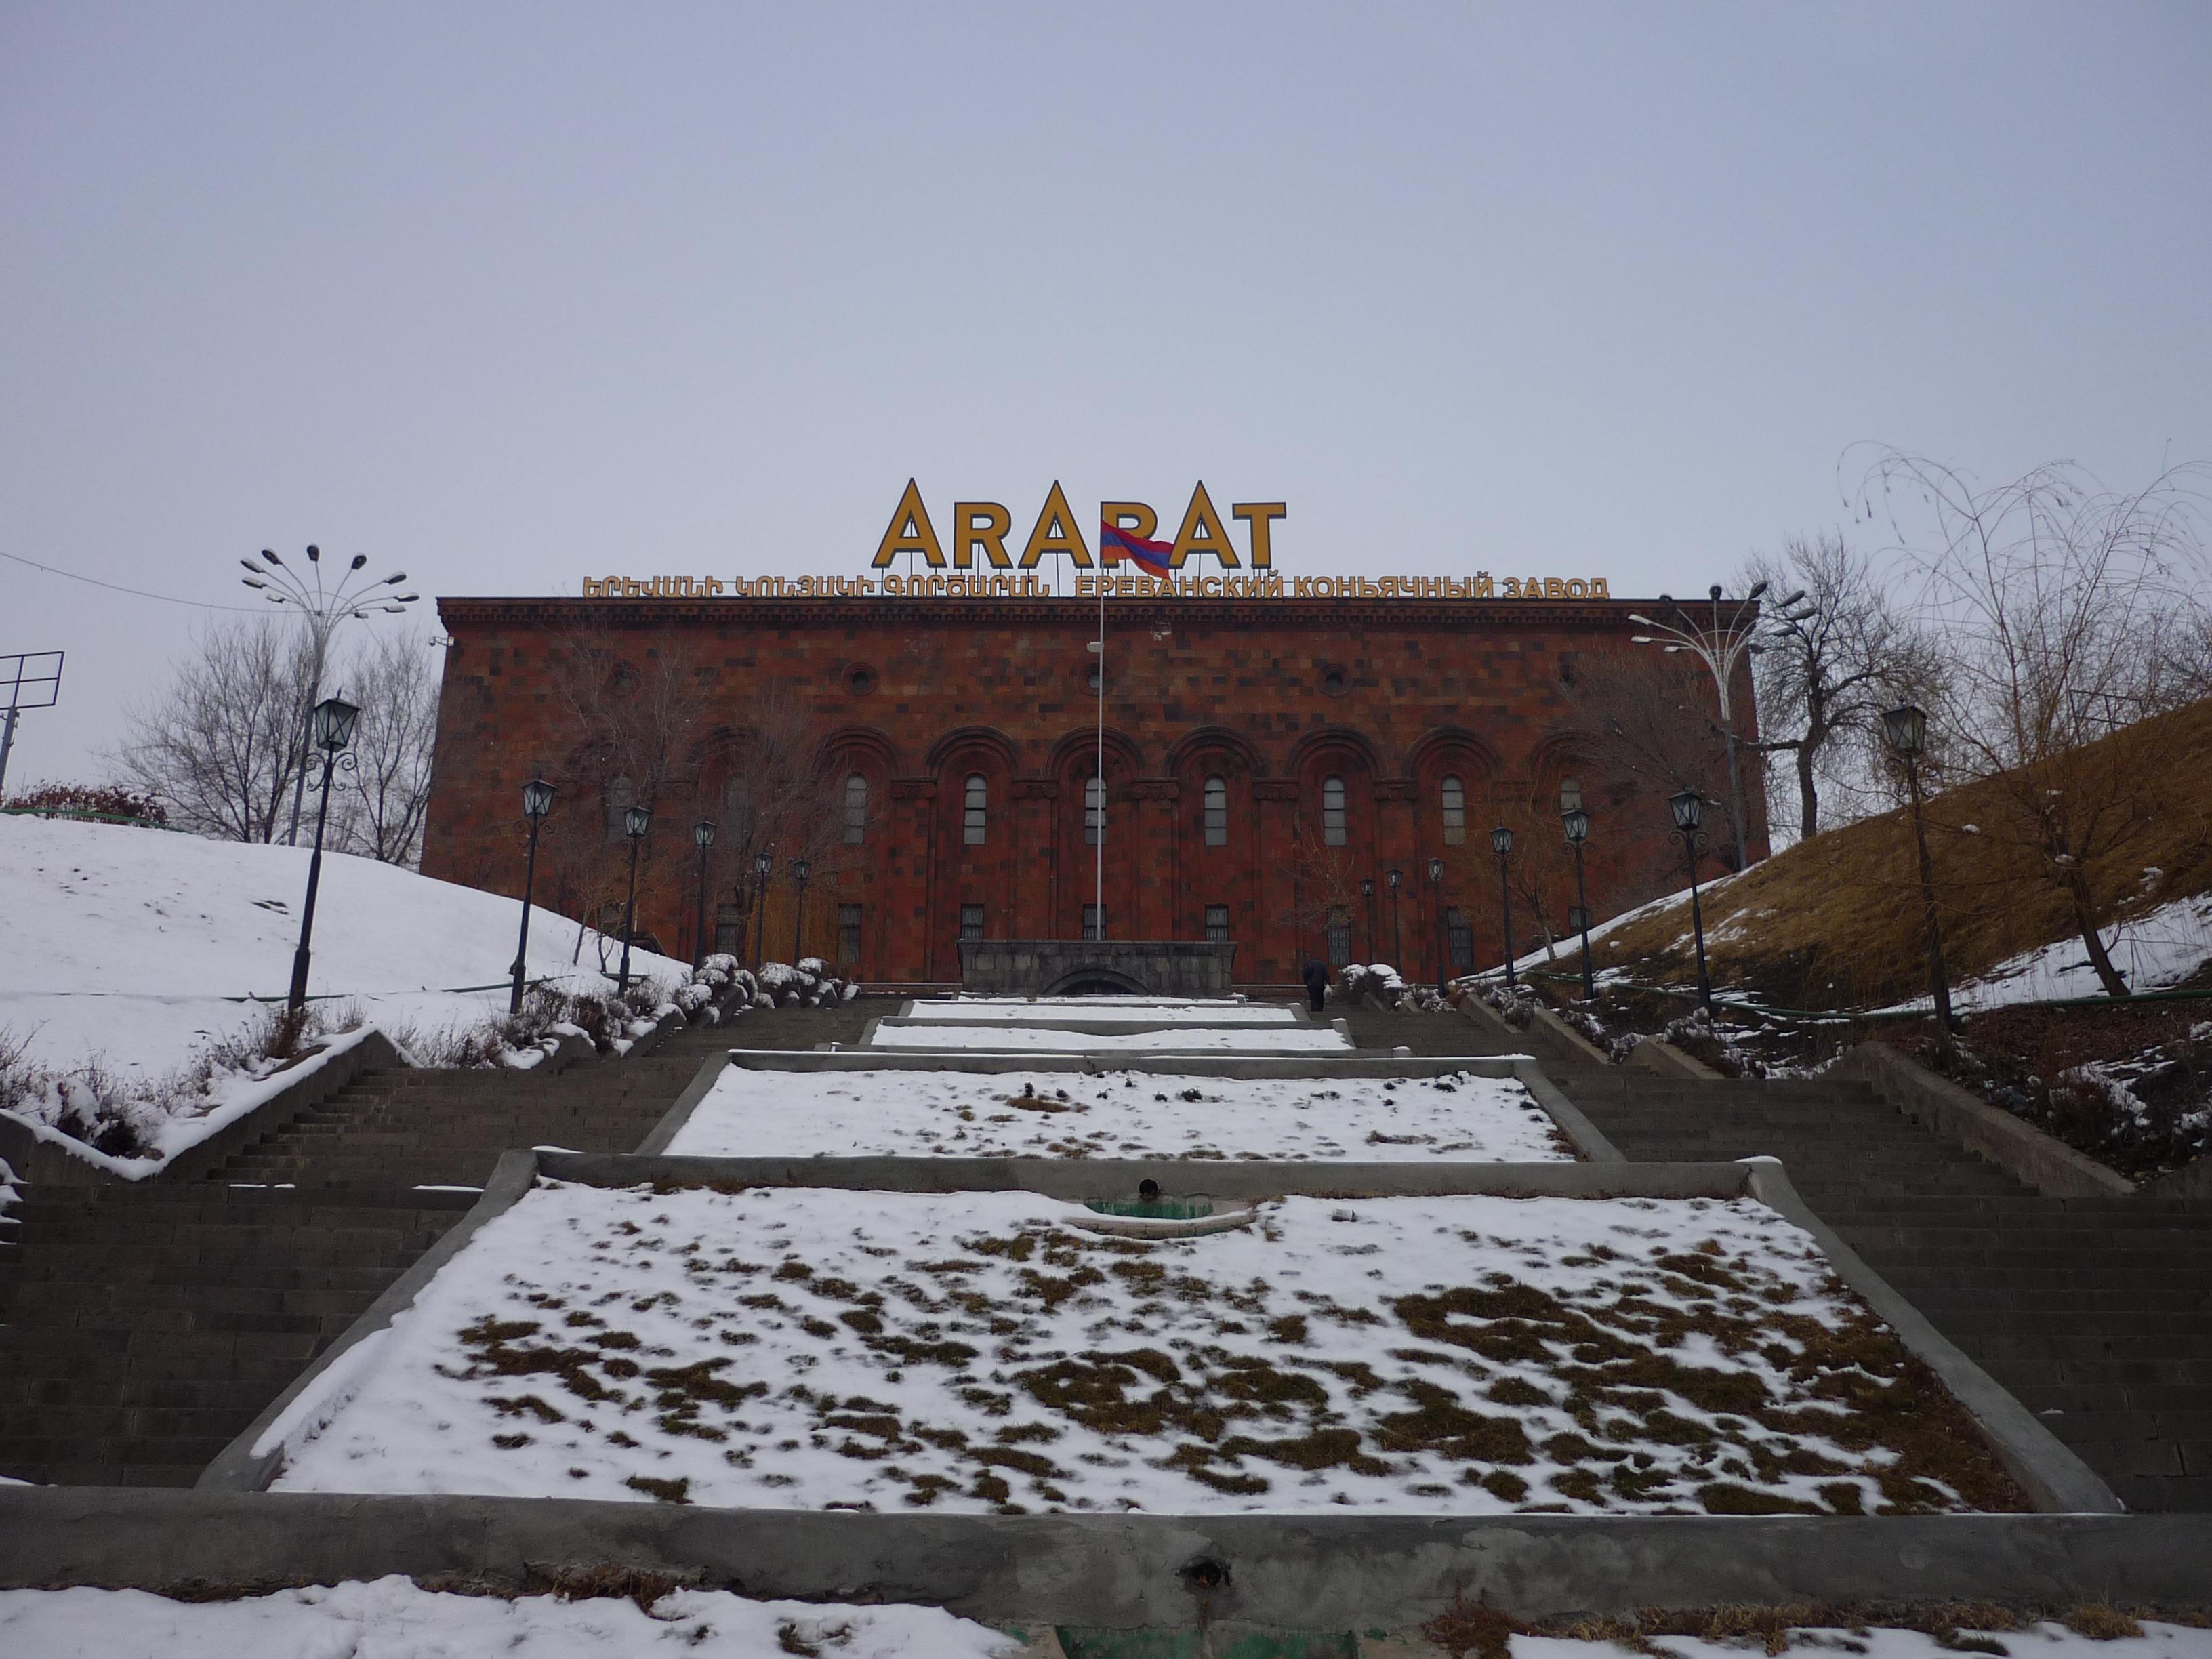 tribeca factory prato winter - photo#32